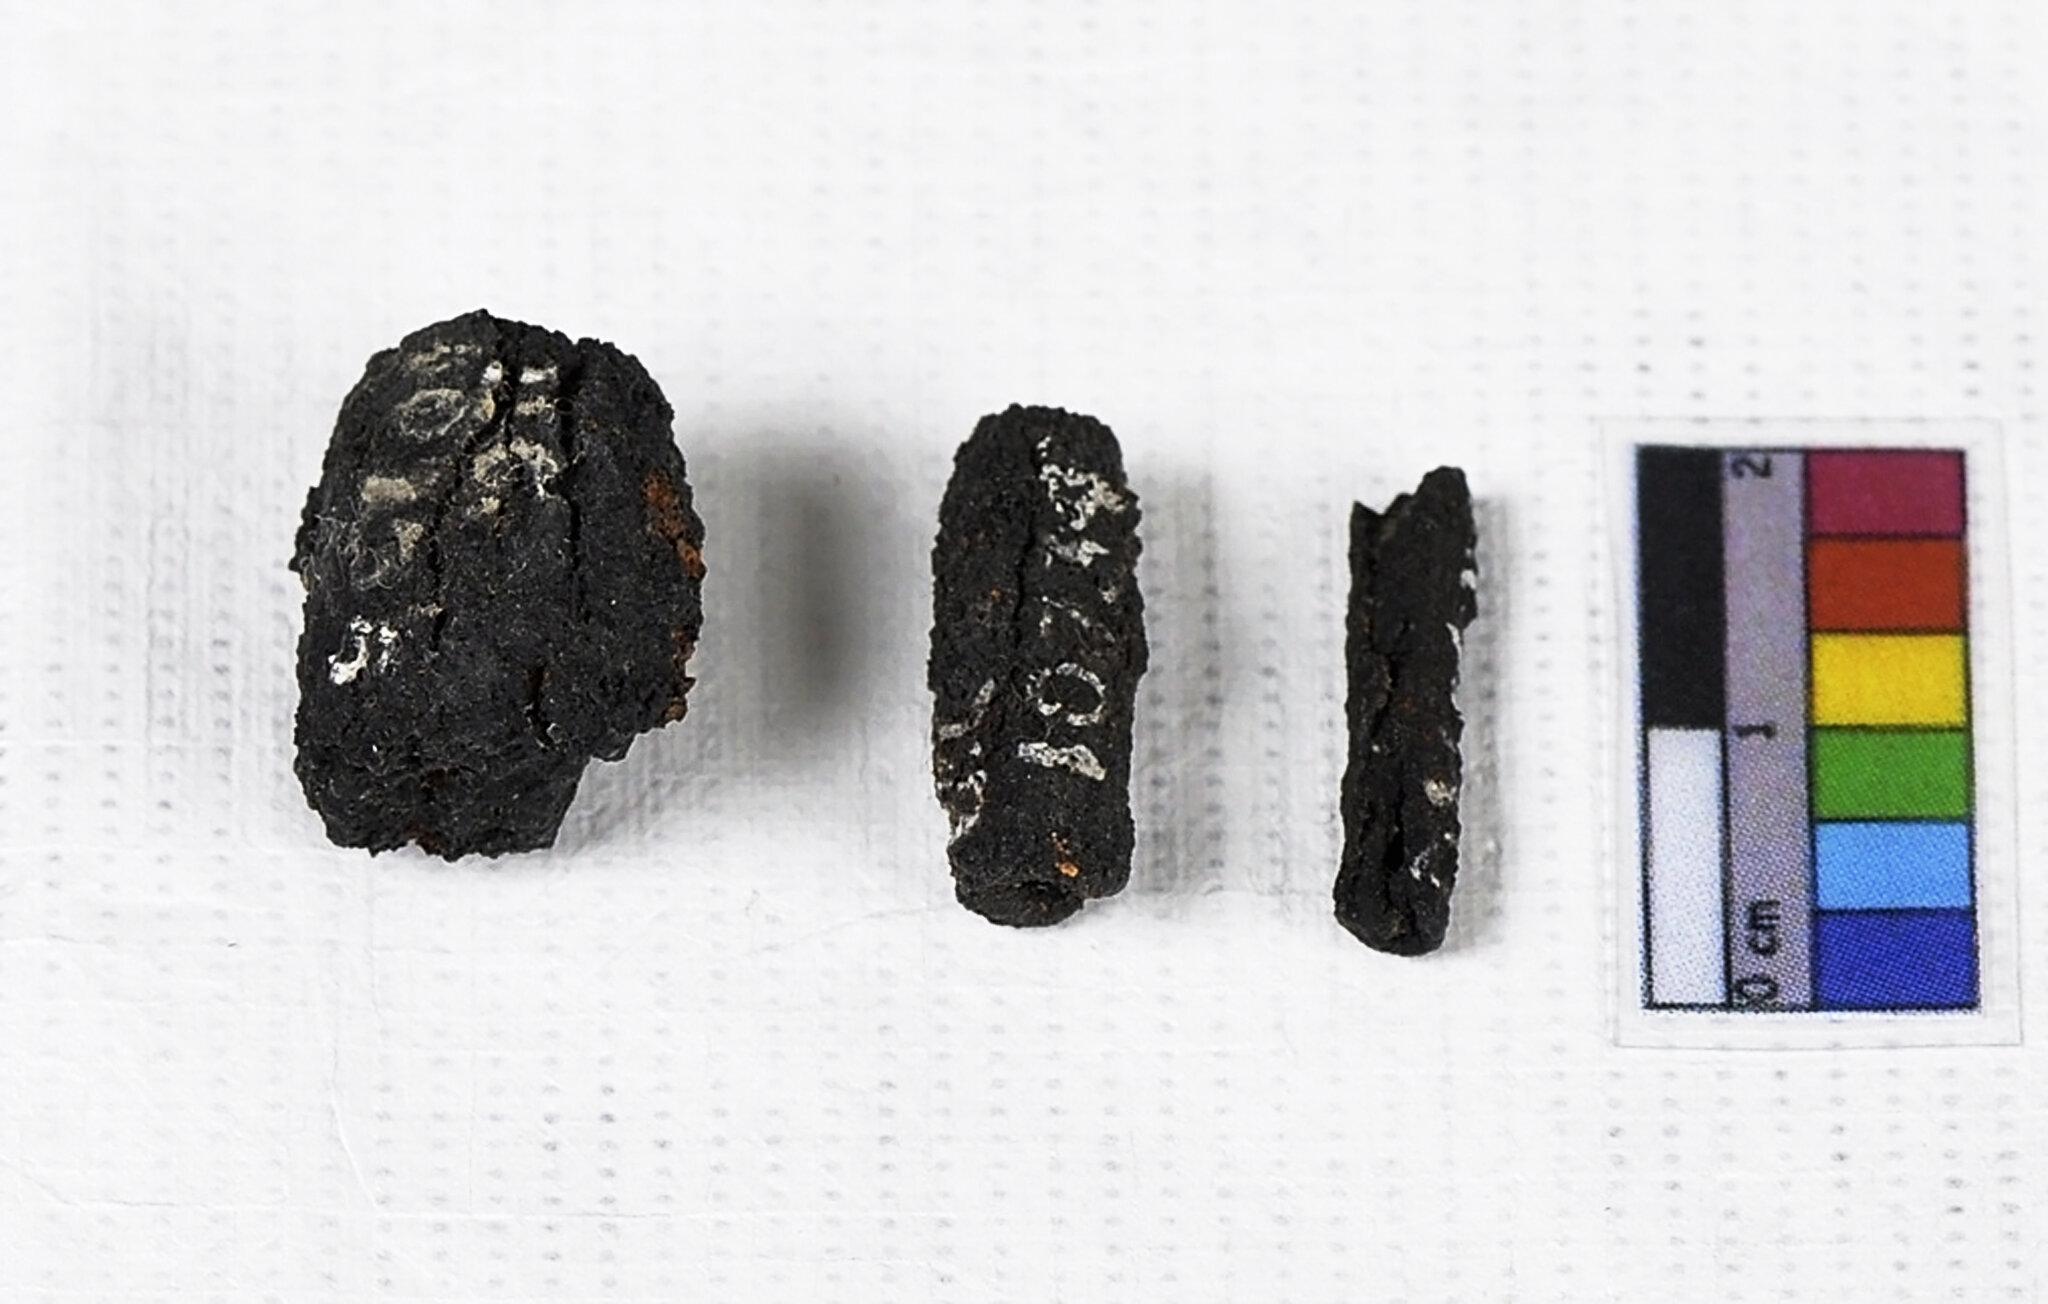 Iron beads from meteorites.